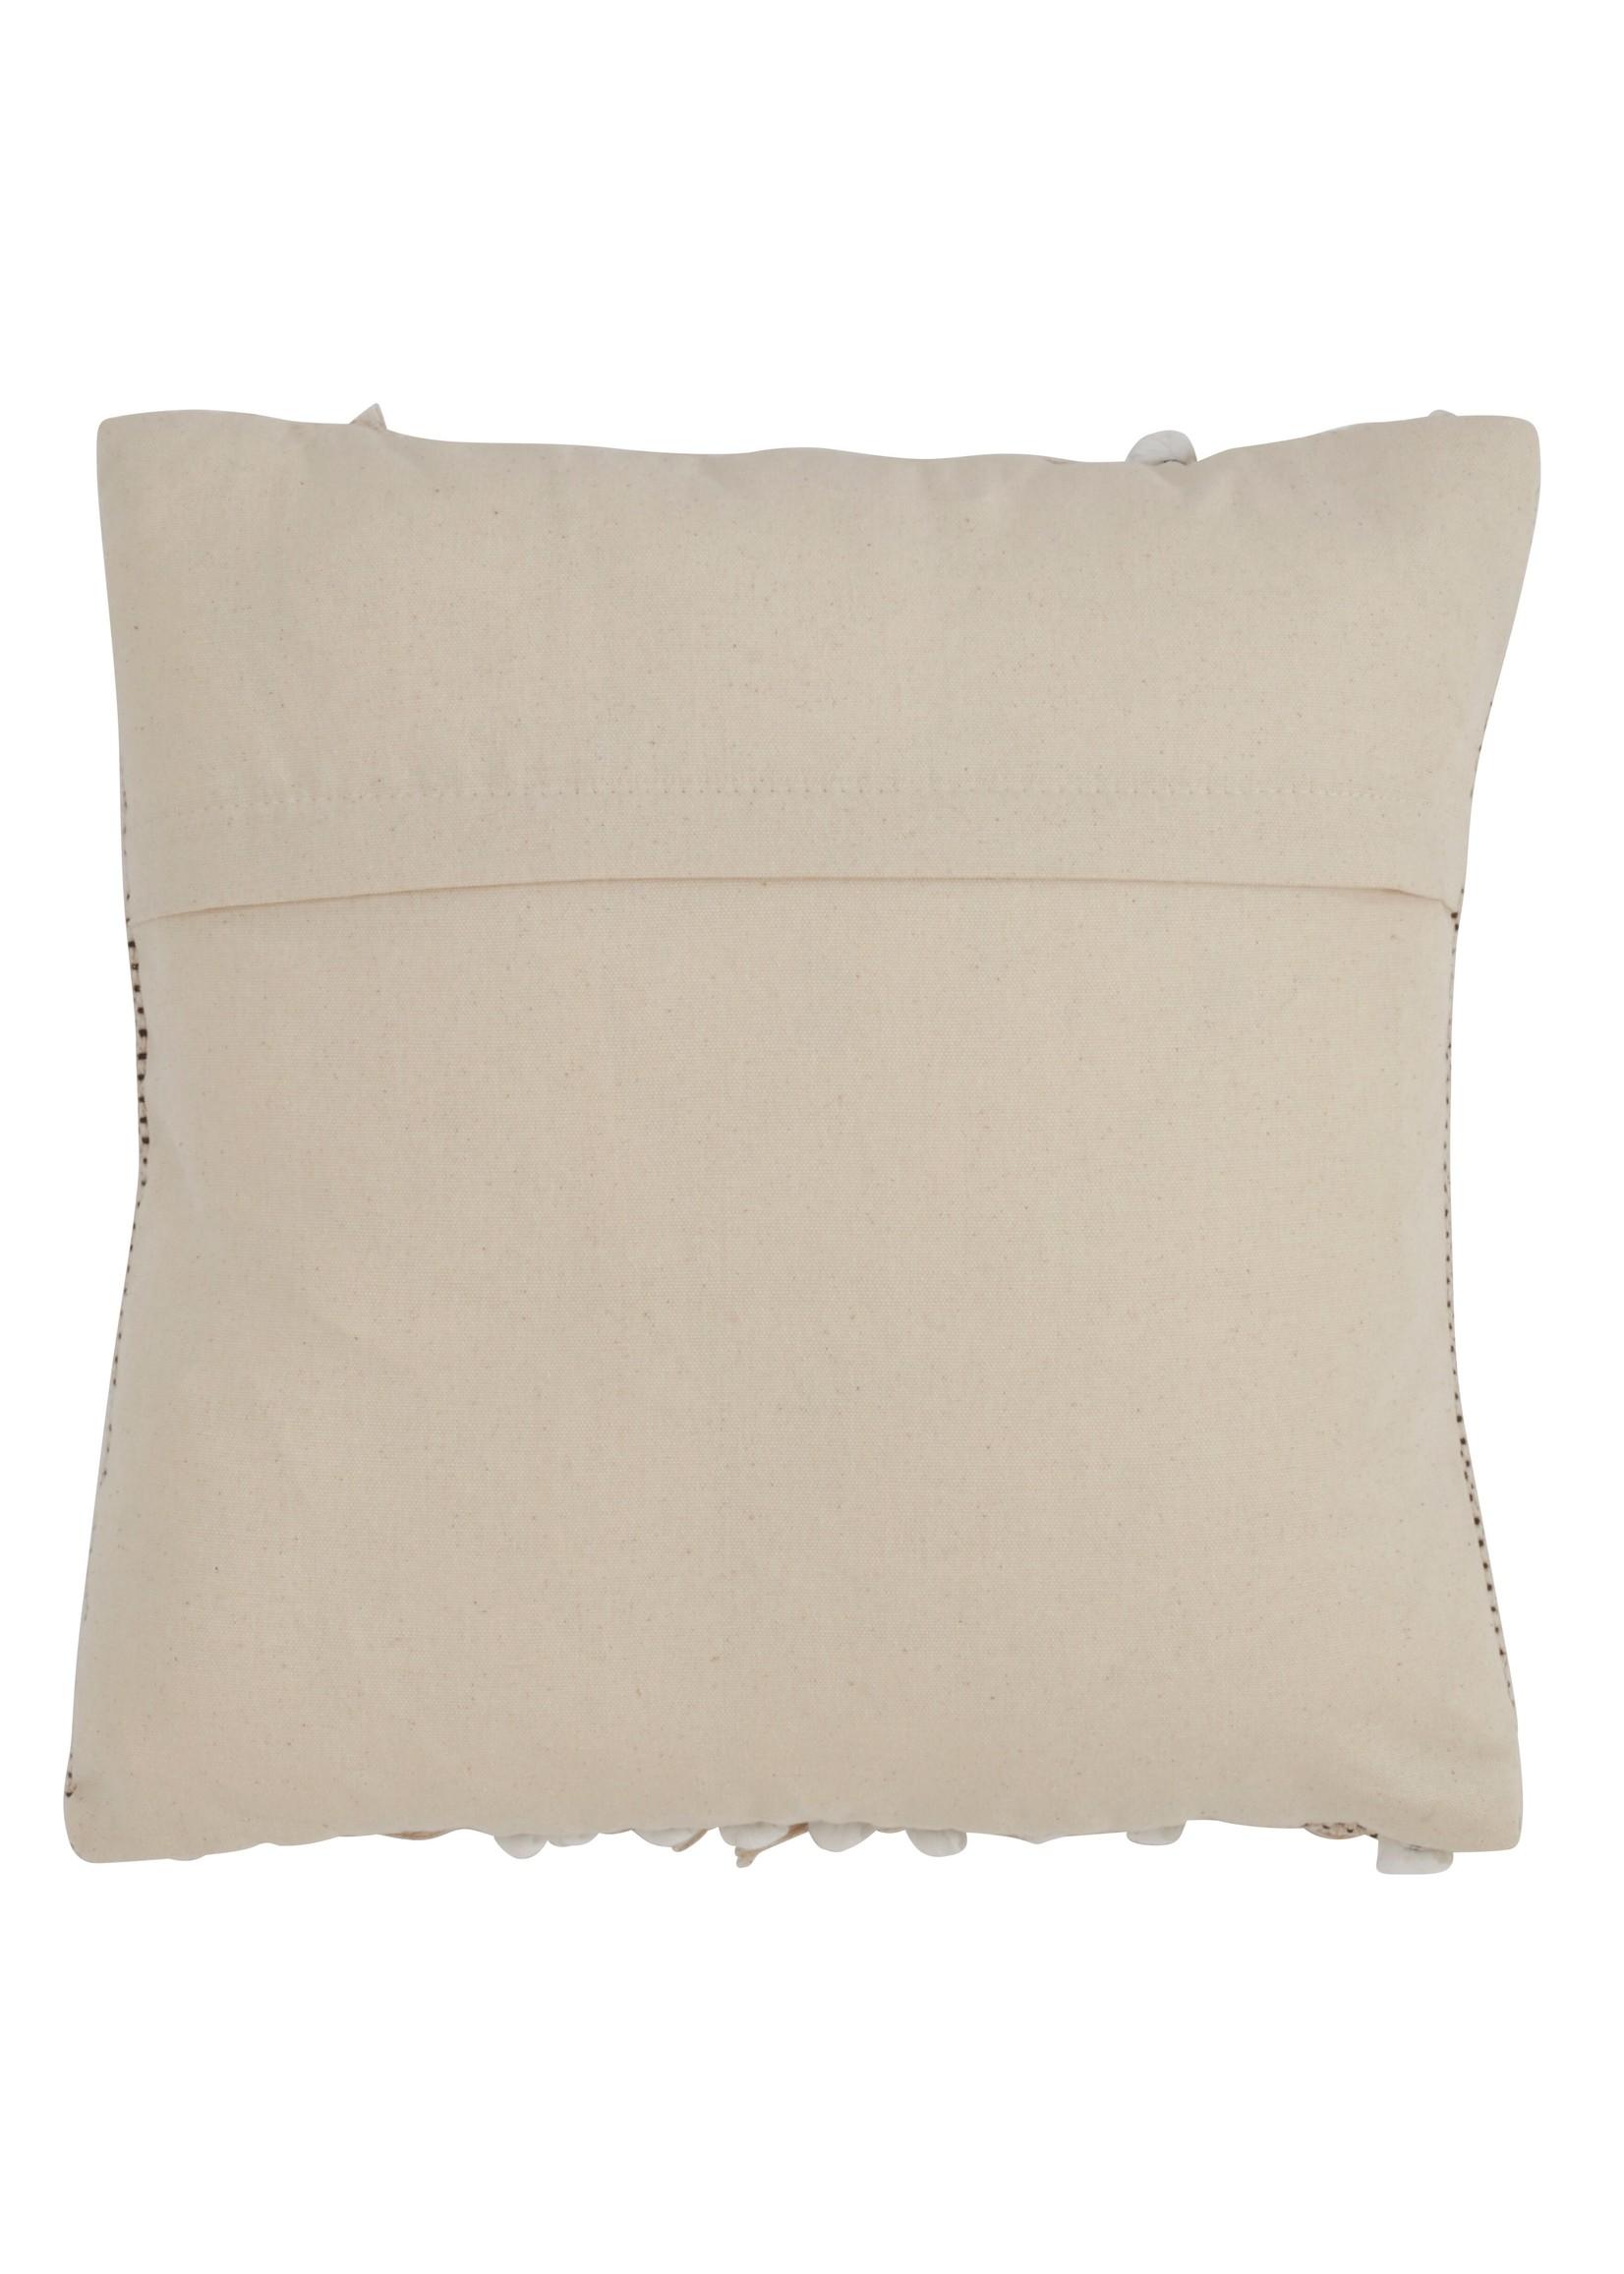 Saro Morocco Pillow Down Filled Natural